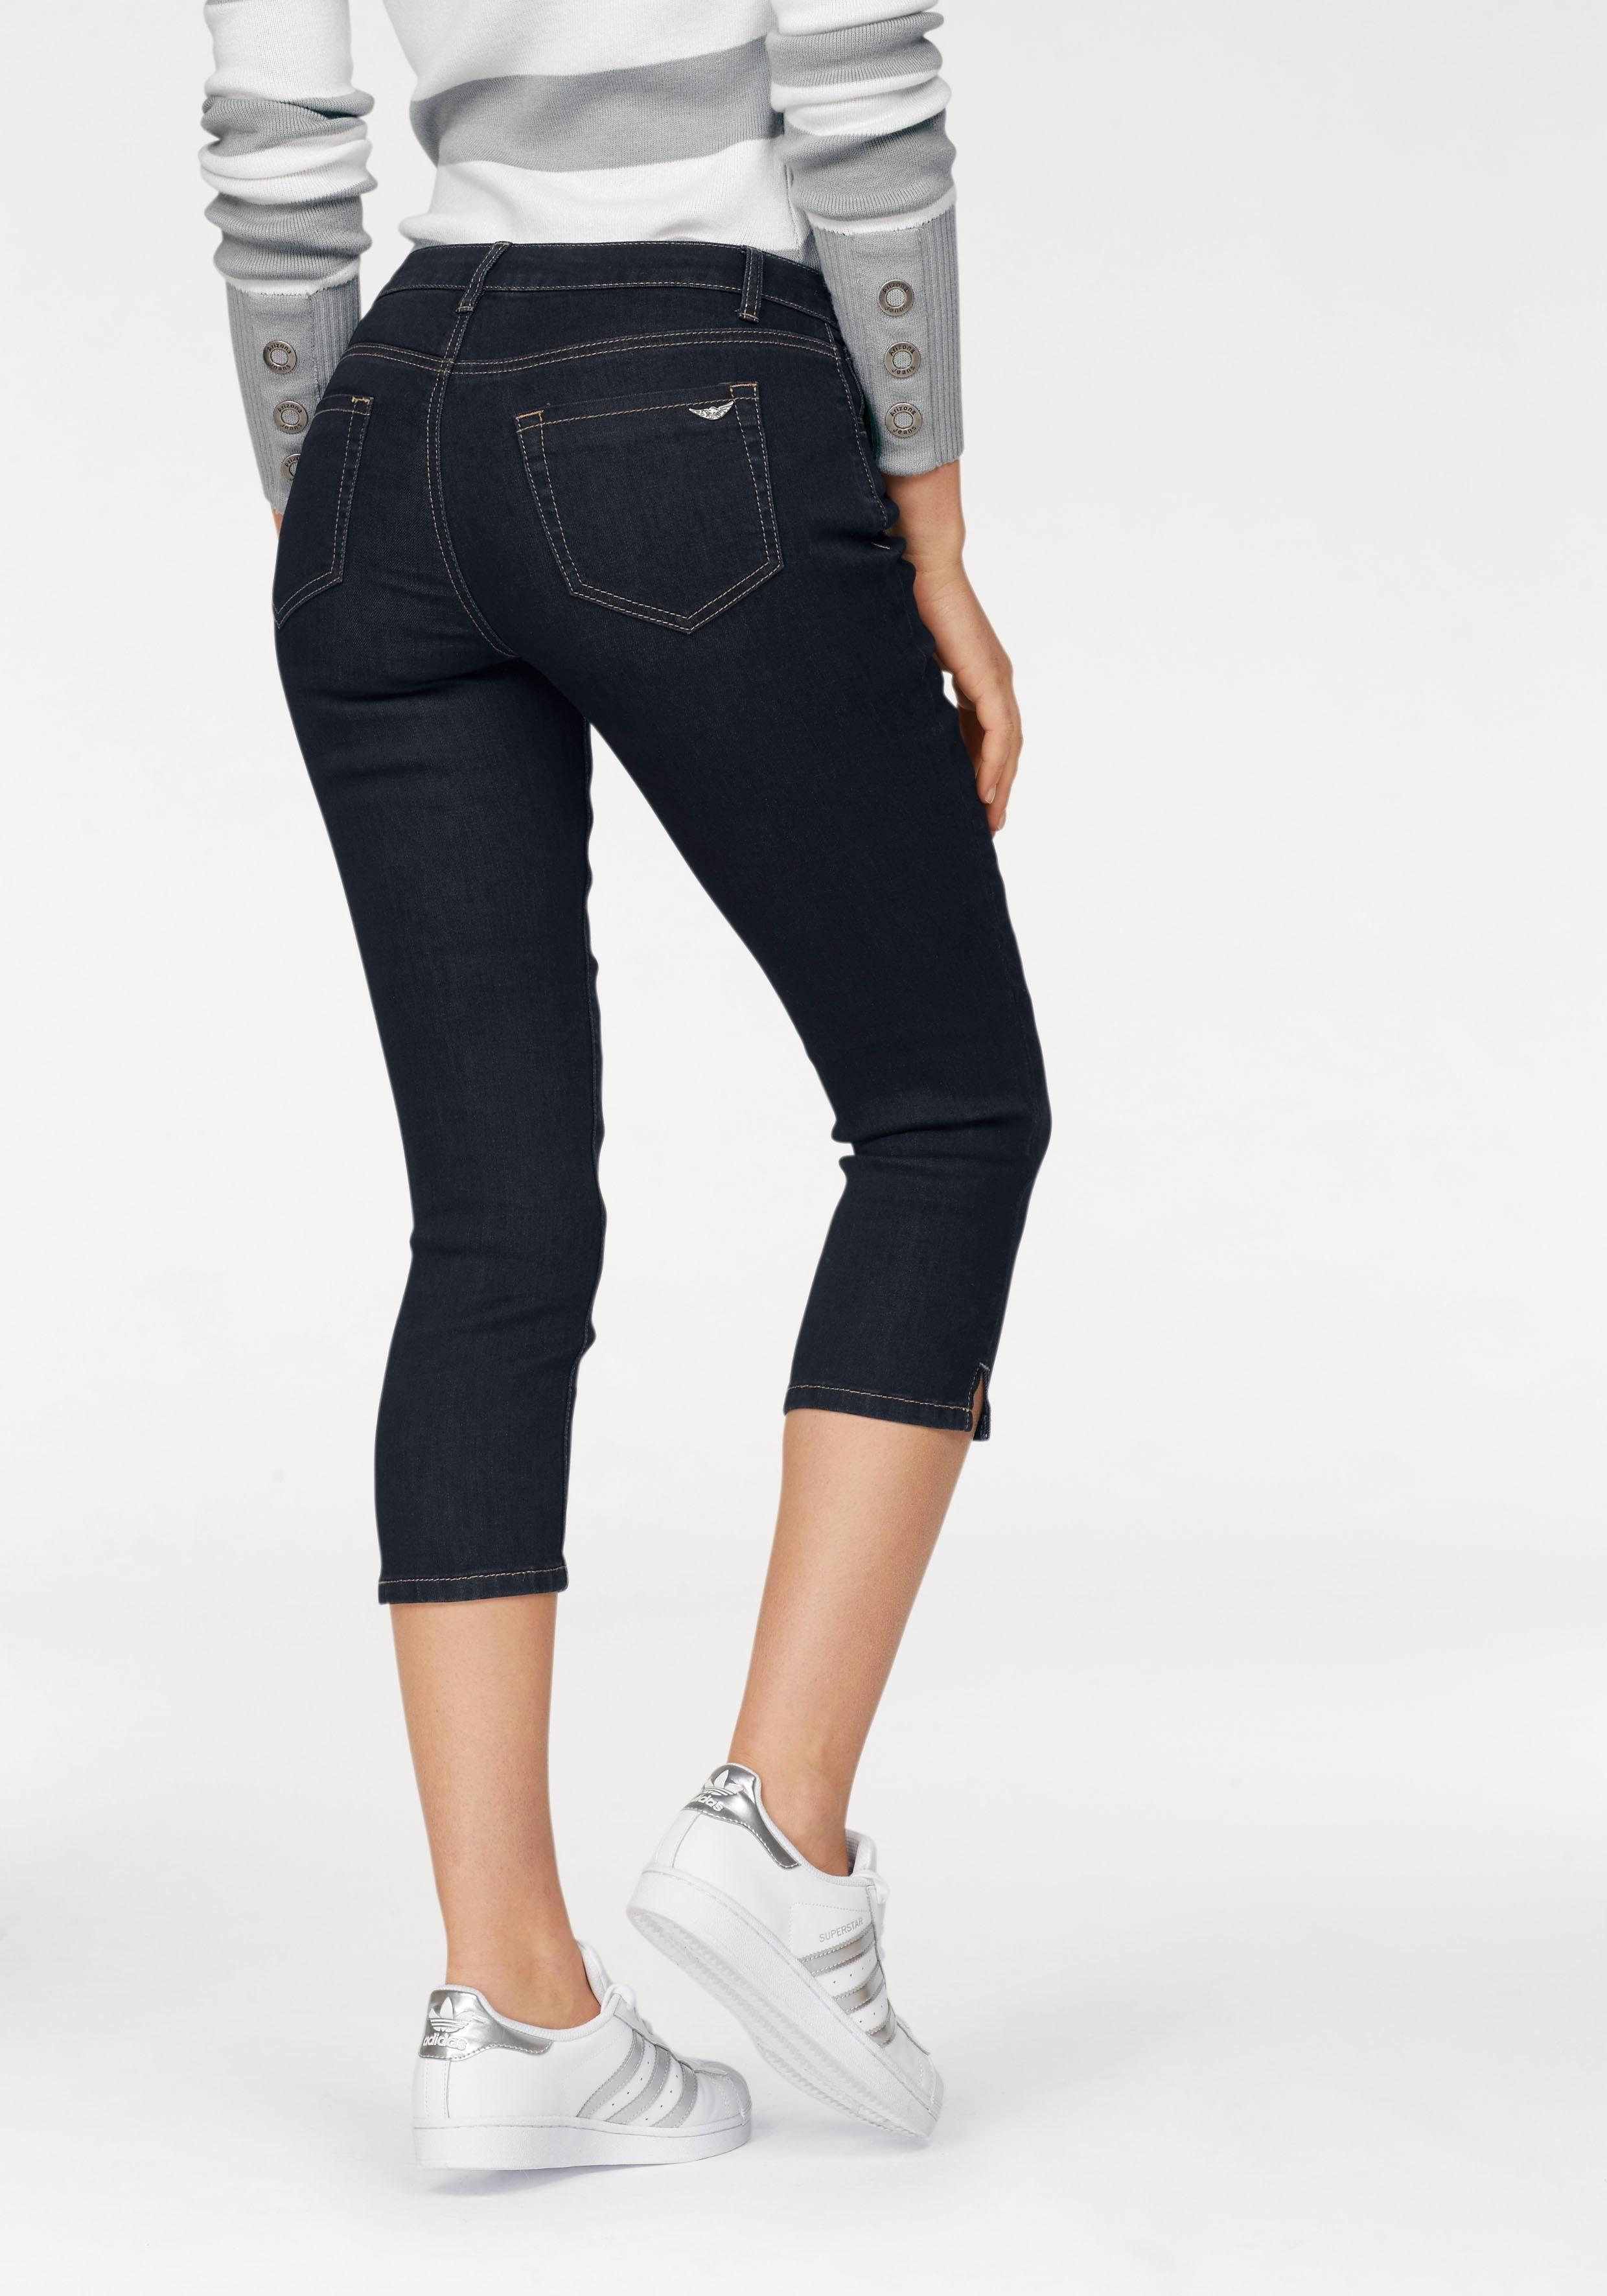 Mustang Jeans 2 Paar Schrecklicher Wert Kleidung & Accessoires Jeans